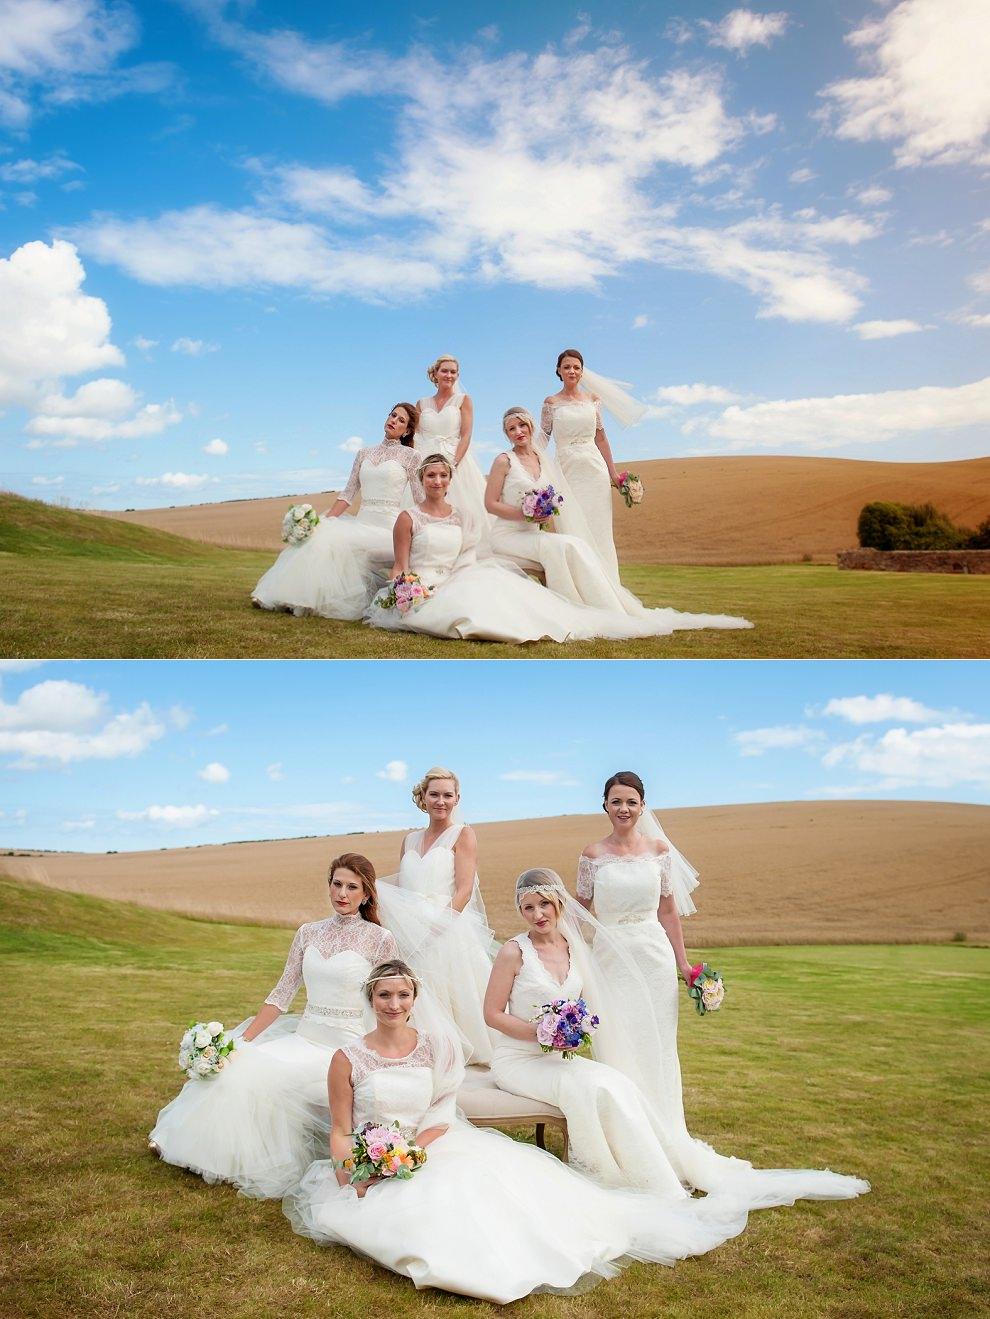 Best-wedding-photos-UK-2015-145